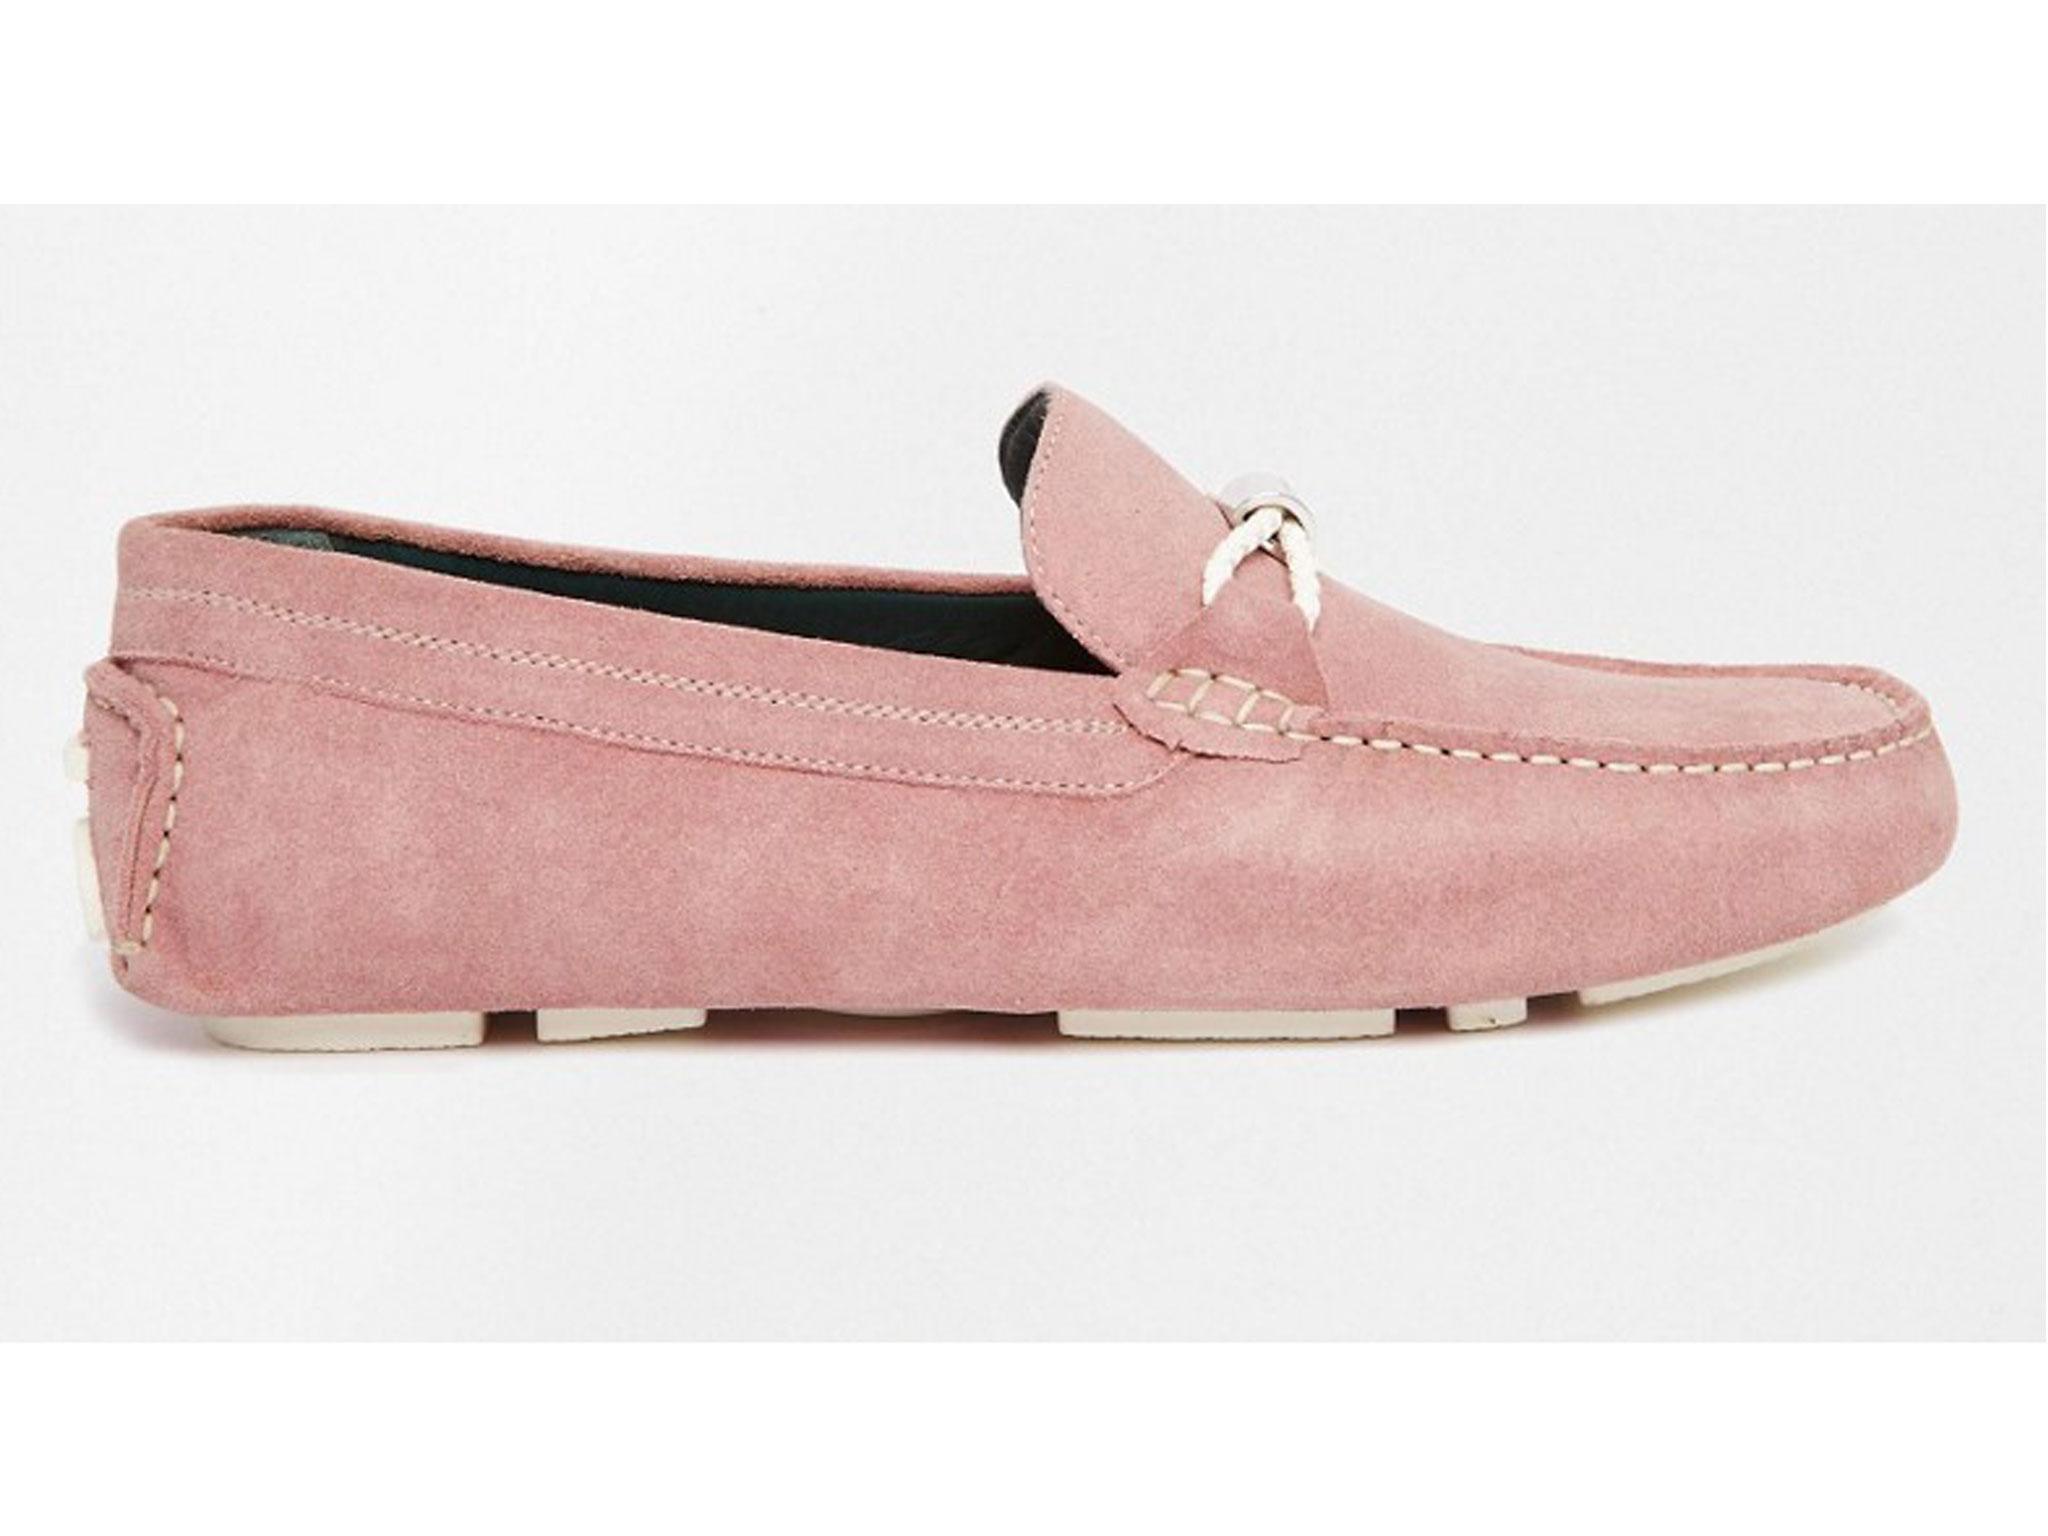 69b72edb4a84ac 10 best men's summer shoes | The Independent